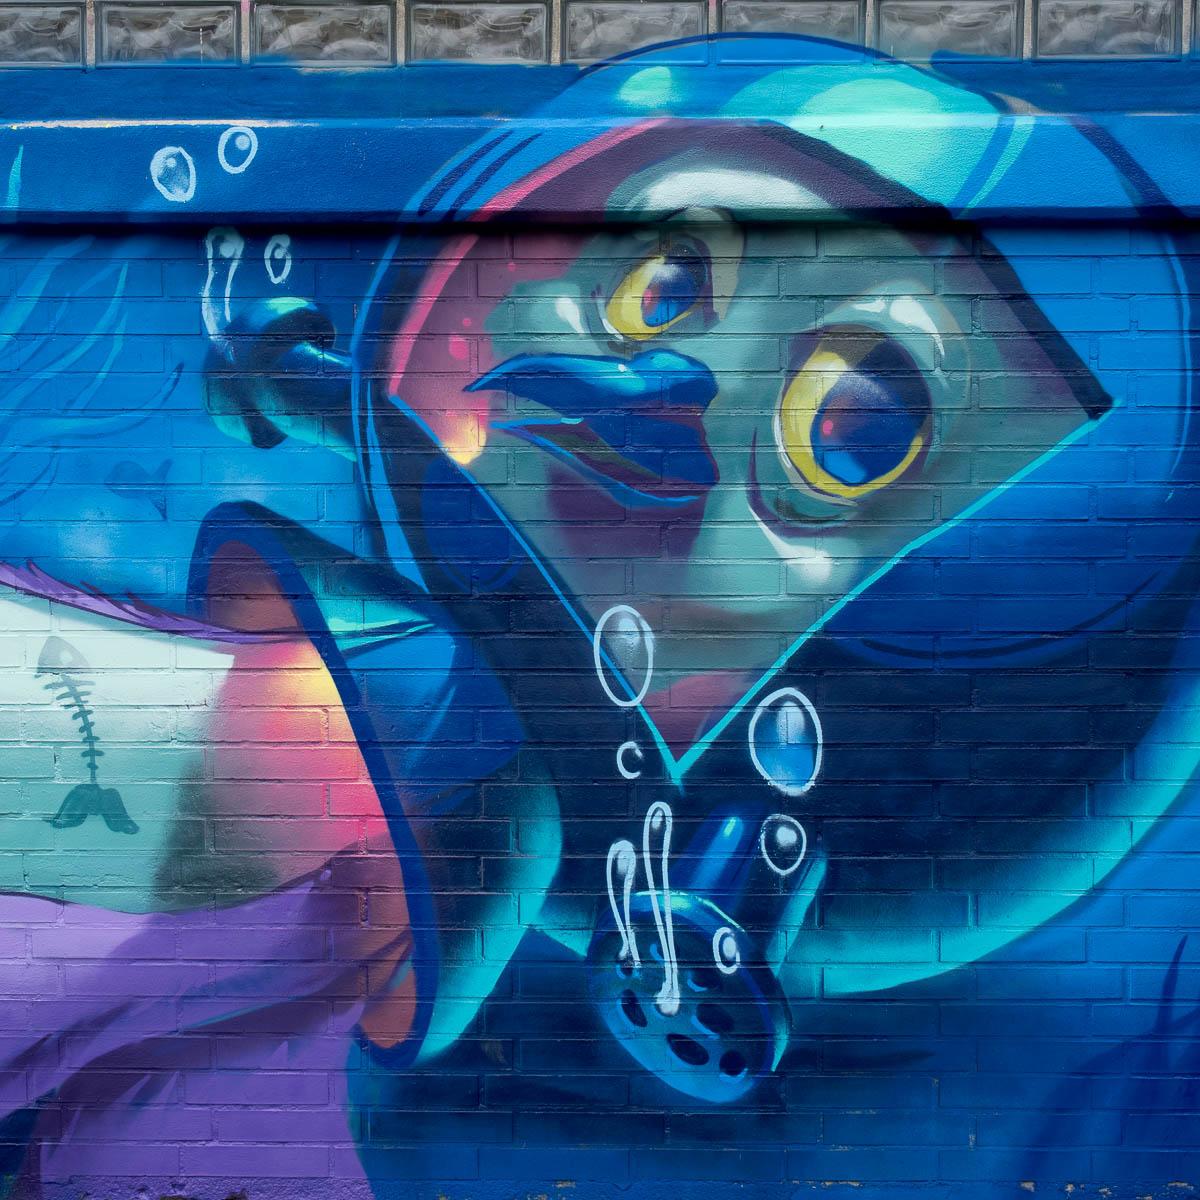 2015-06-18 EM1 Graffiti Mainz-Kastel MOS 2015 0042